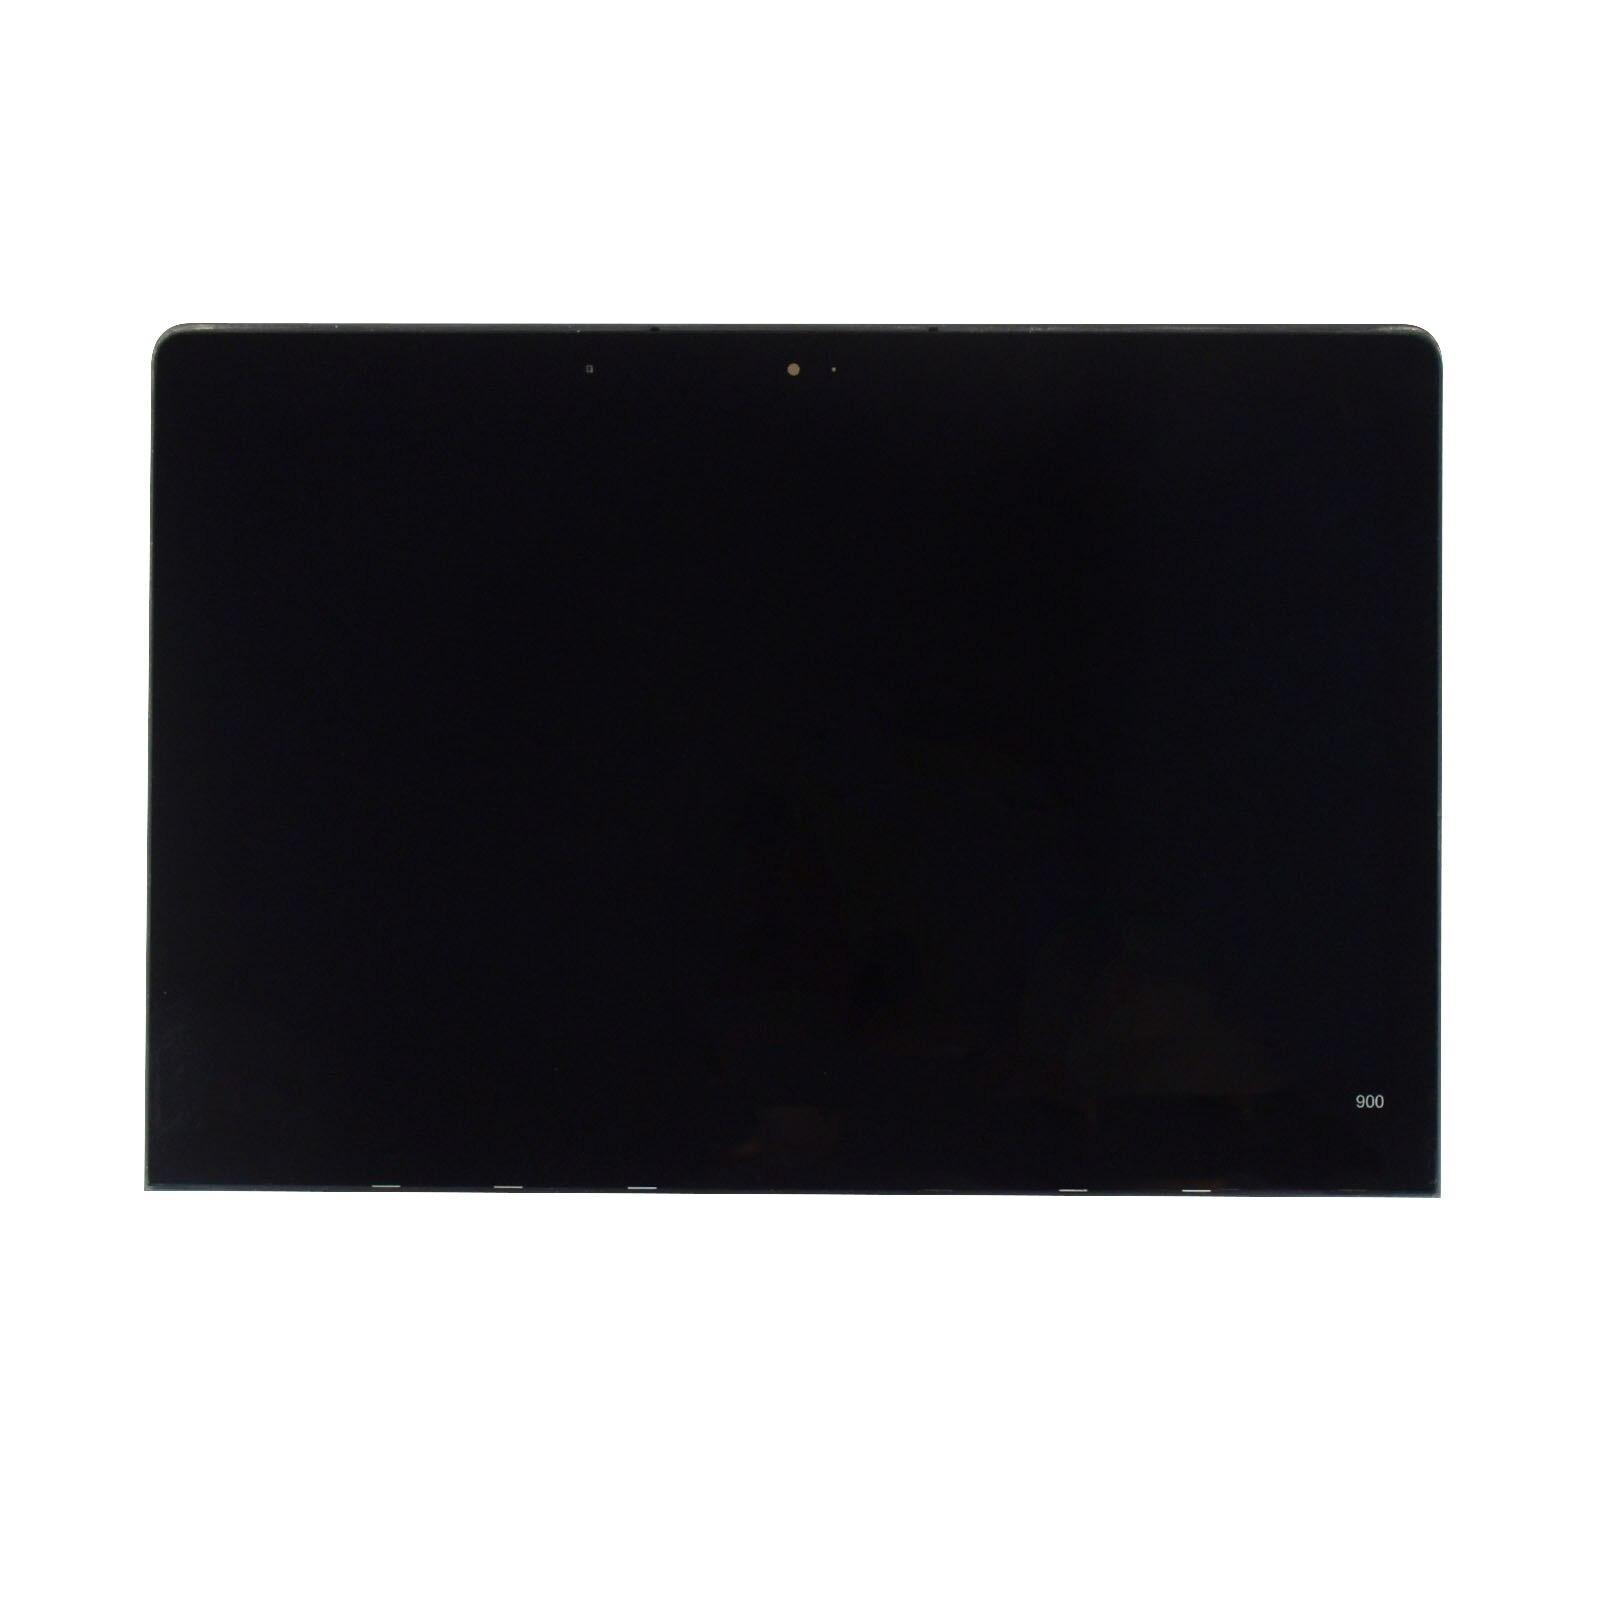 Nuevo 13,3 pulgadas para Lenovo IdeaPad Yoga 900-13ISK2 pantalla LCD MONTAJE DE digitalizador con pantalla táctil